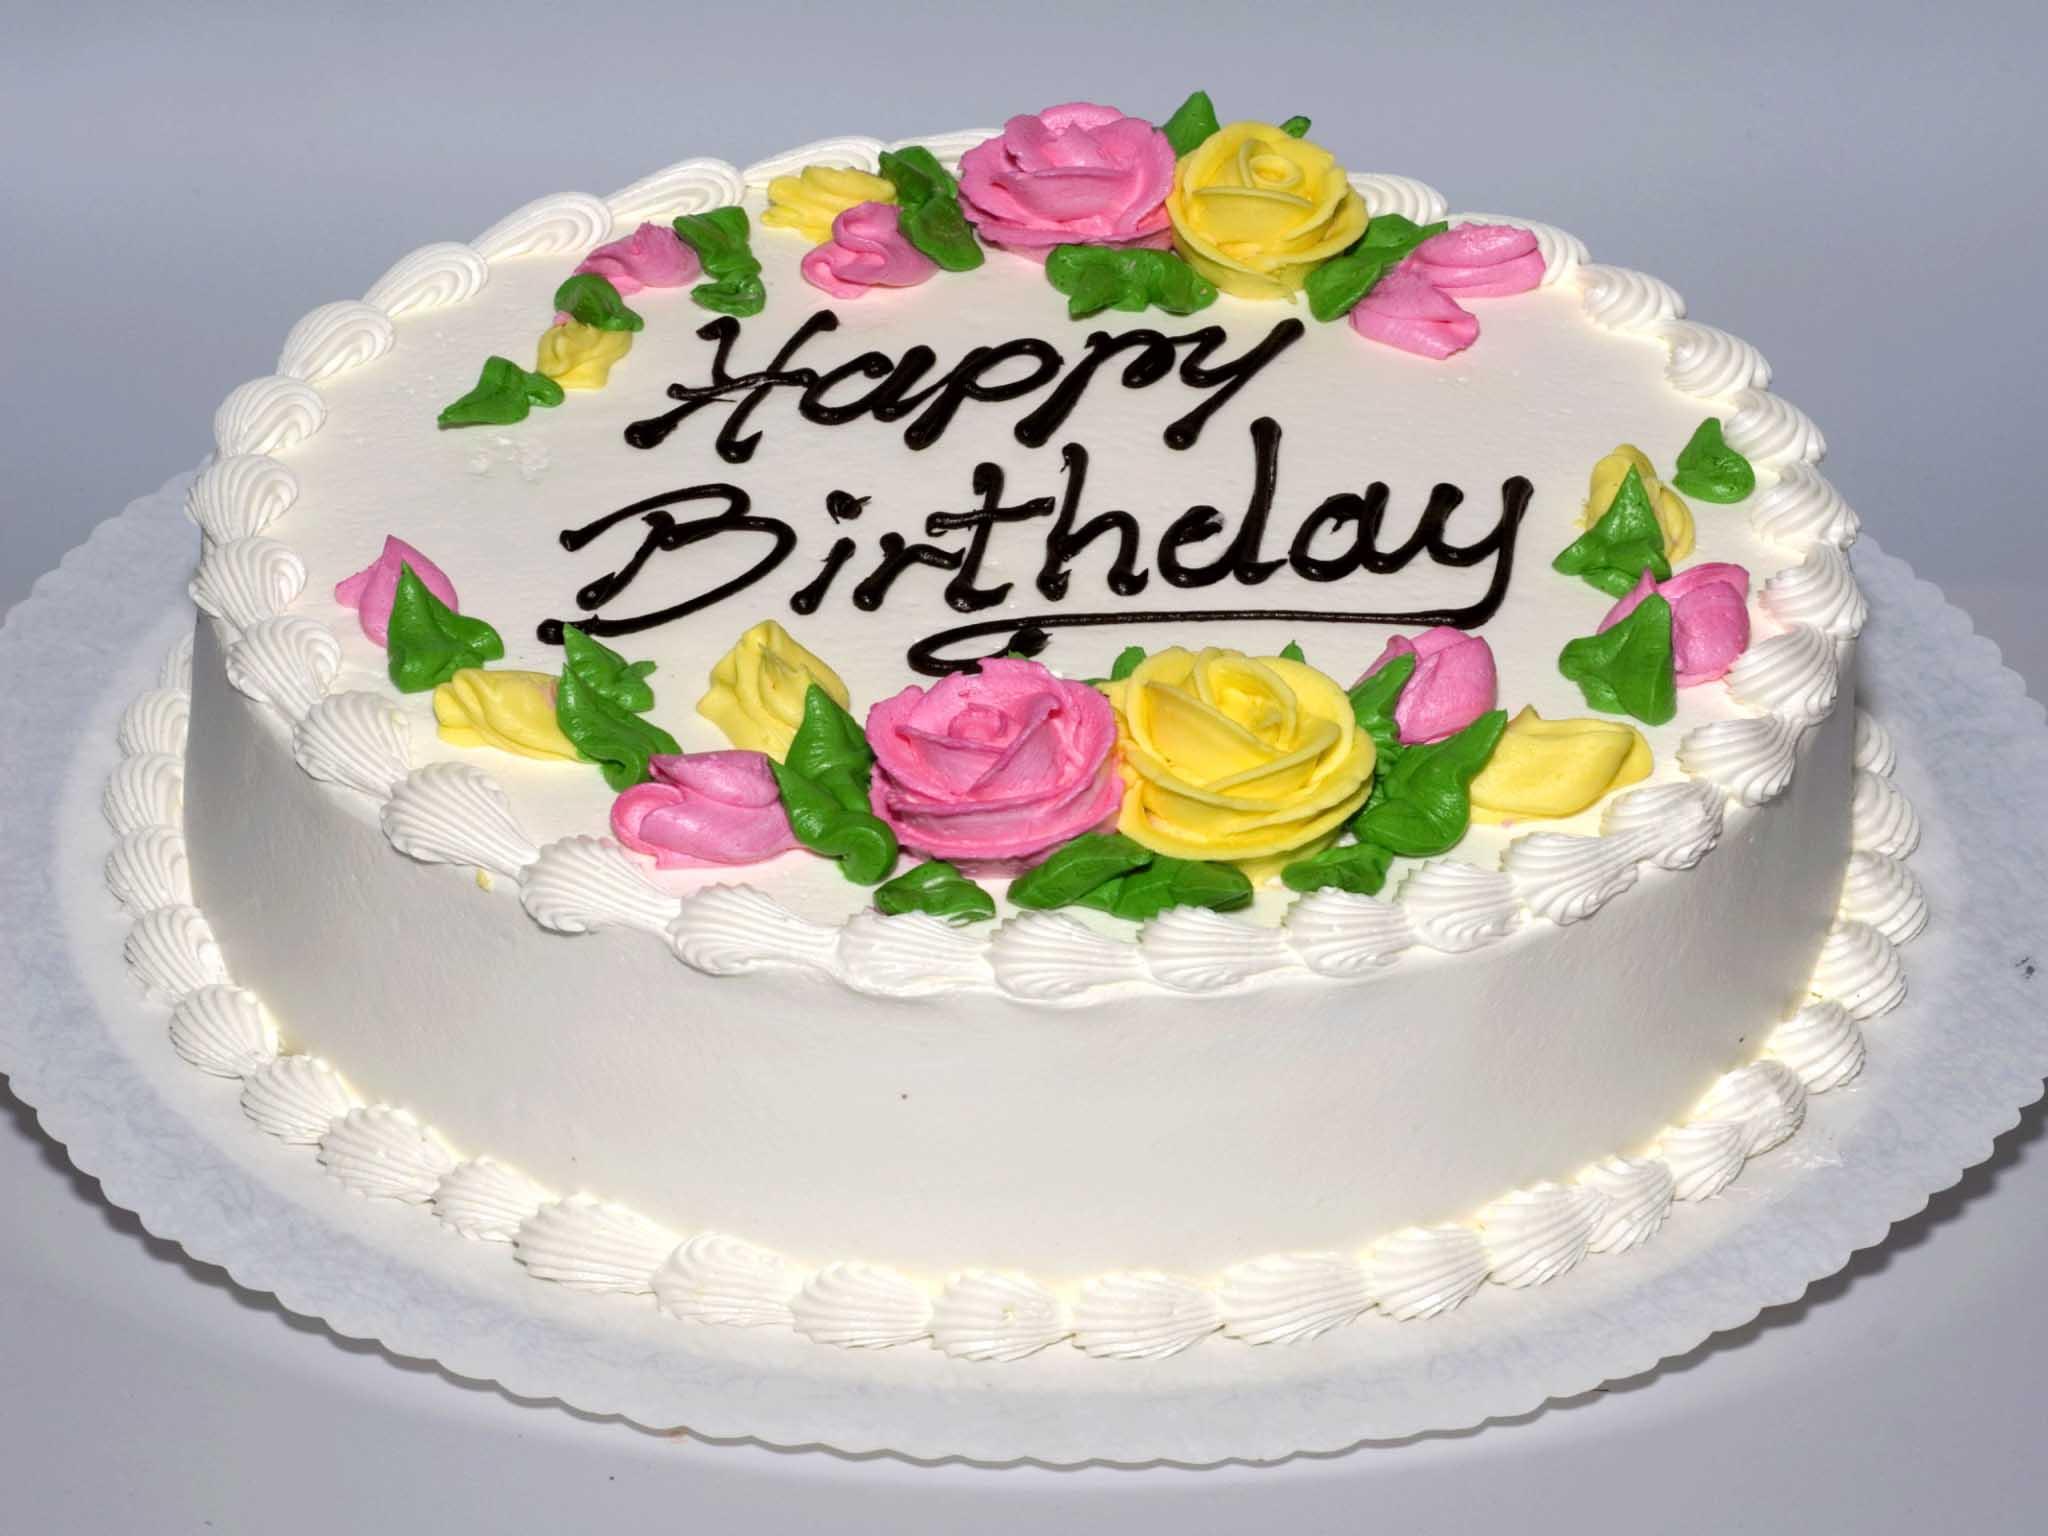 Happy Birthday Cake 2048x1536 Download Hd Wallpaper Wallpapertip